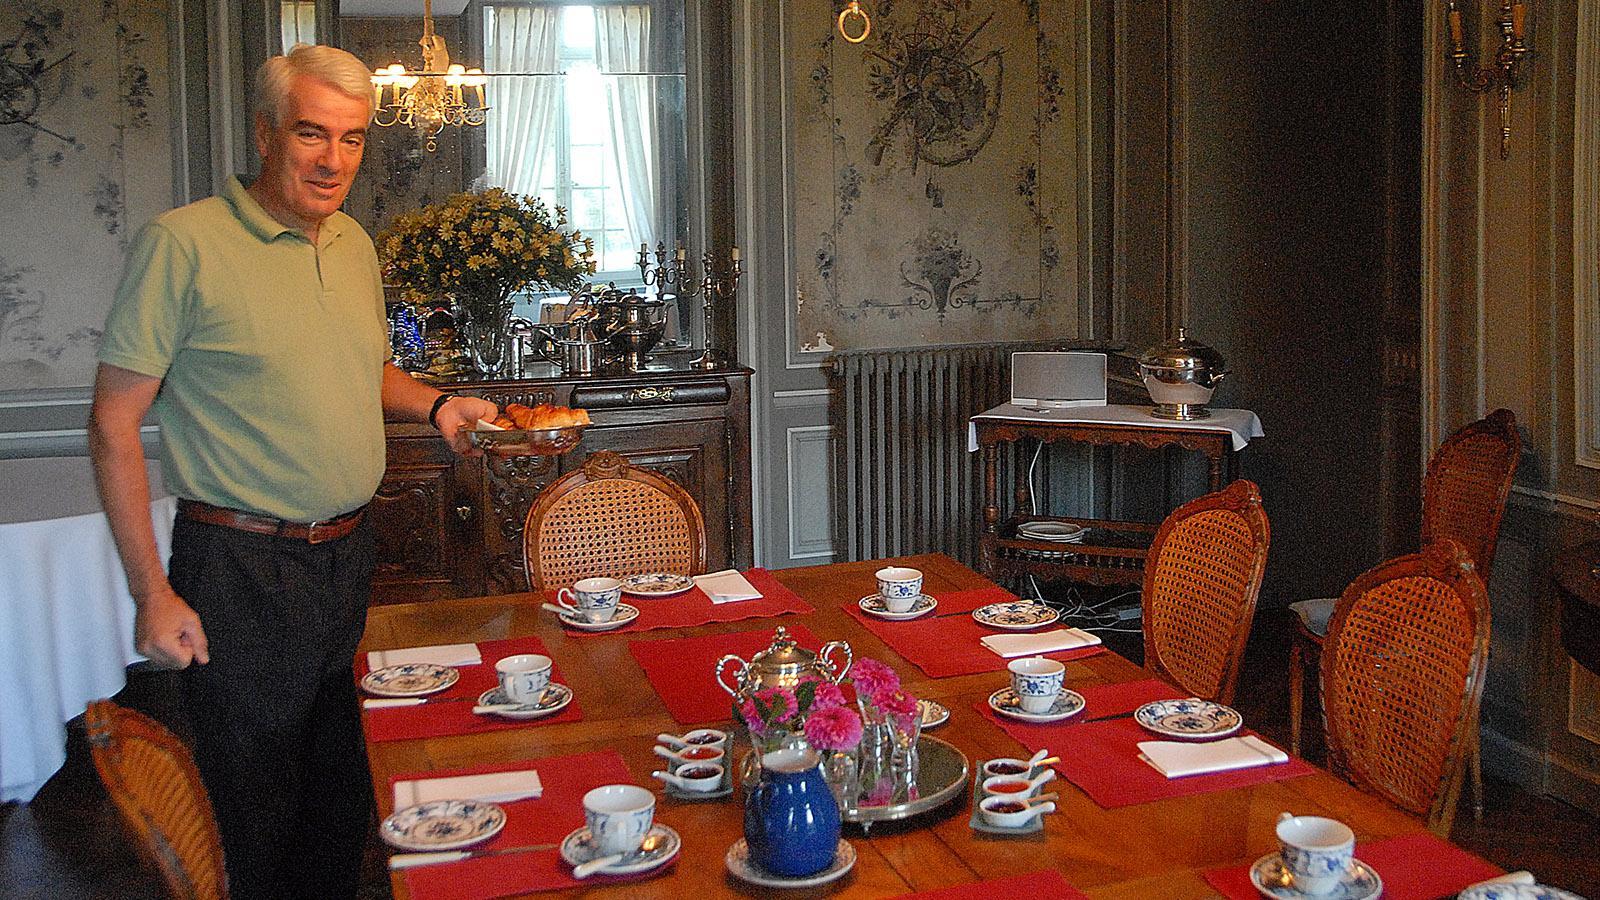 Château de Sarzeaux: Madame kocht, Monsieur serviert. Foto: Hilke Maunder